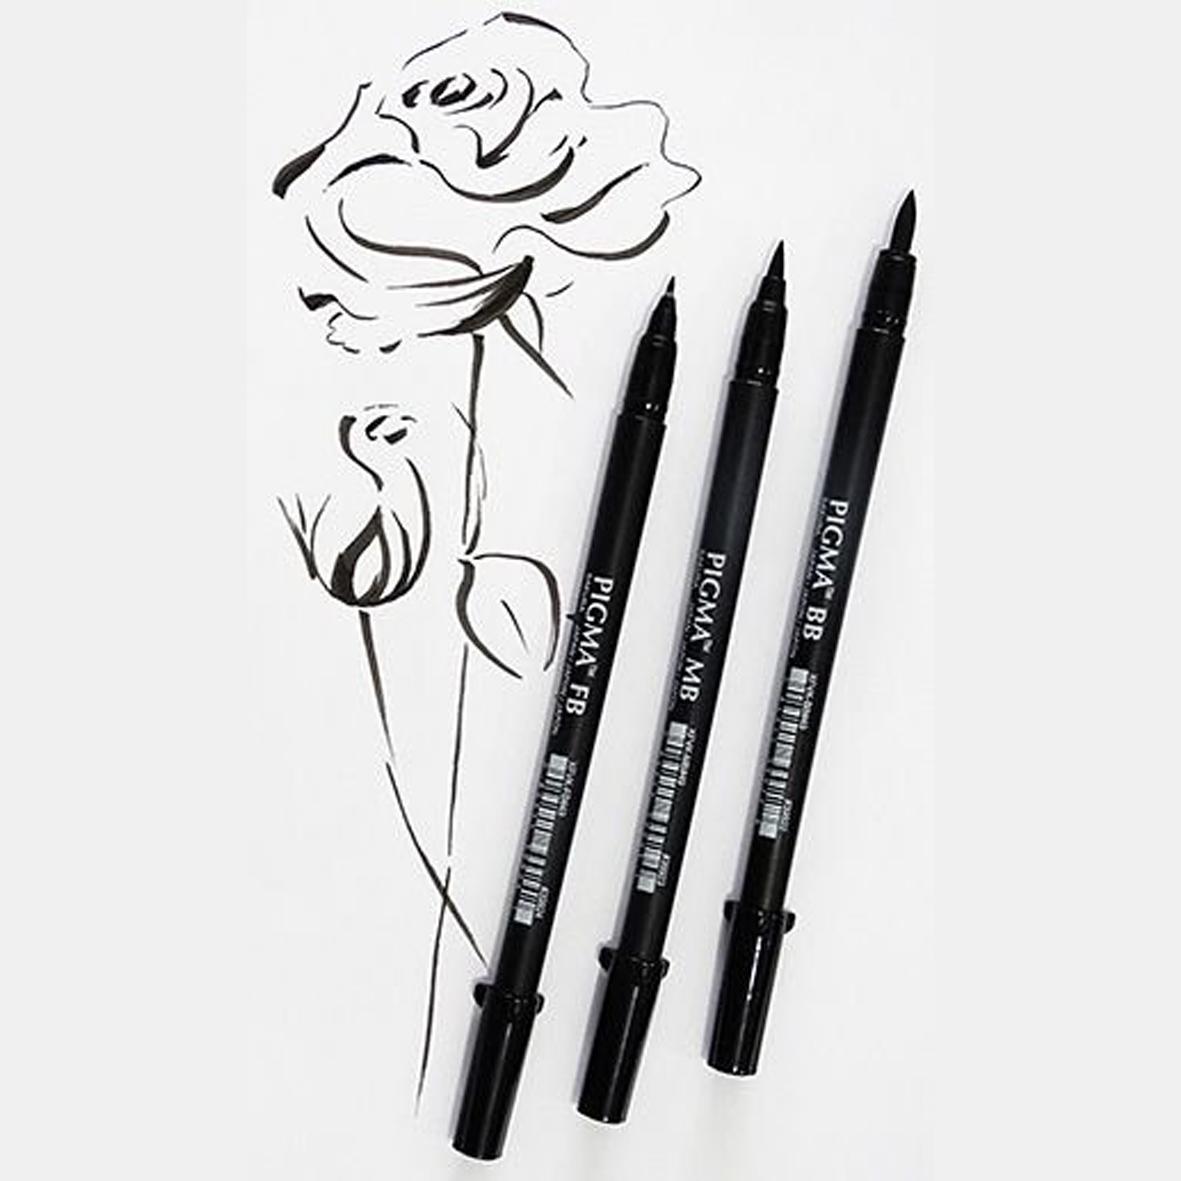 Caneta Ponta Pincel Pigma Brush Pen Sakura Profissional